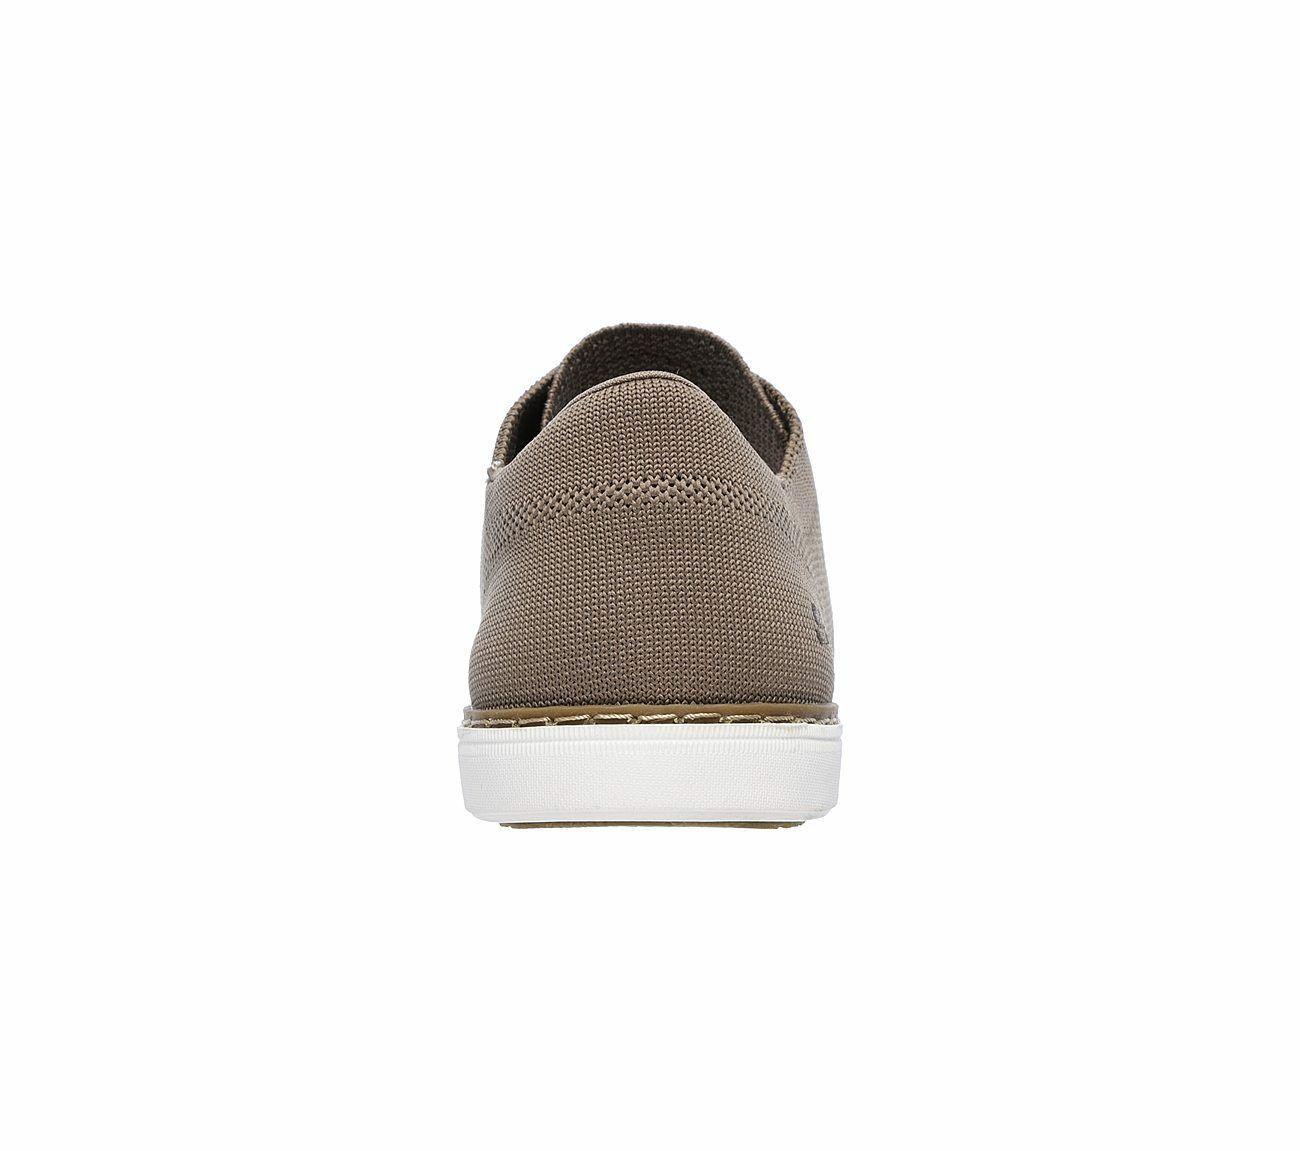 65088, SKECHERS, Lanson Revero, USA Men's Lace Up, Classic Fit, Casual Shoes image 10